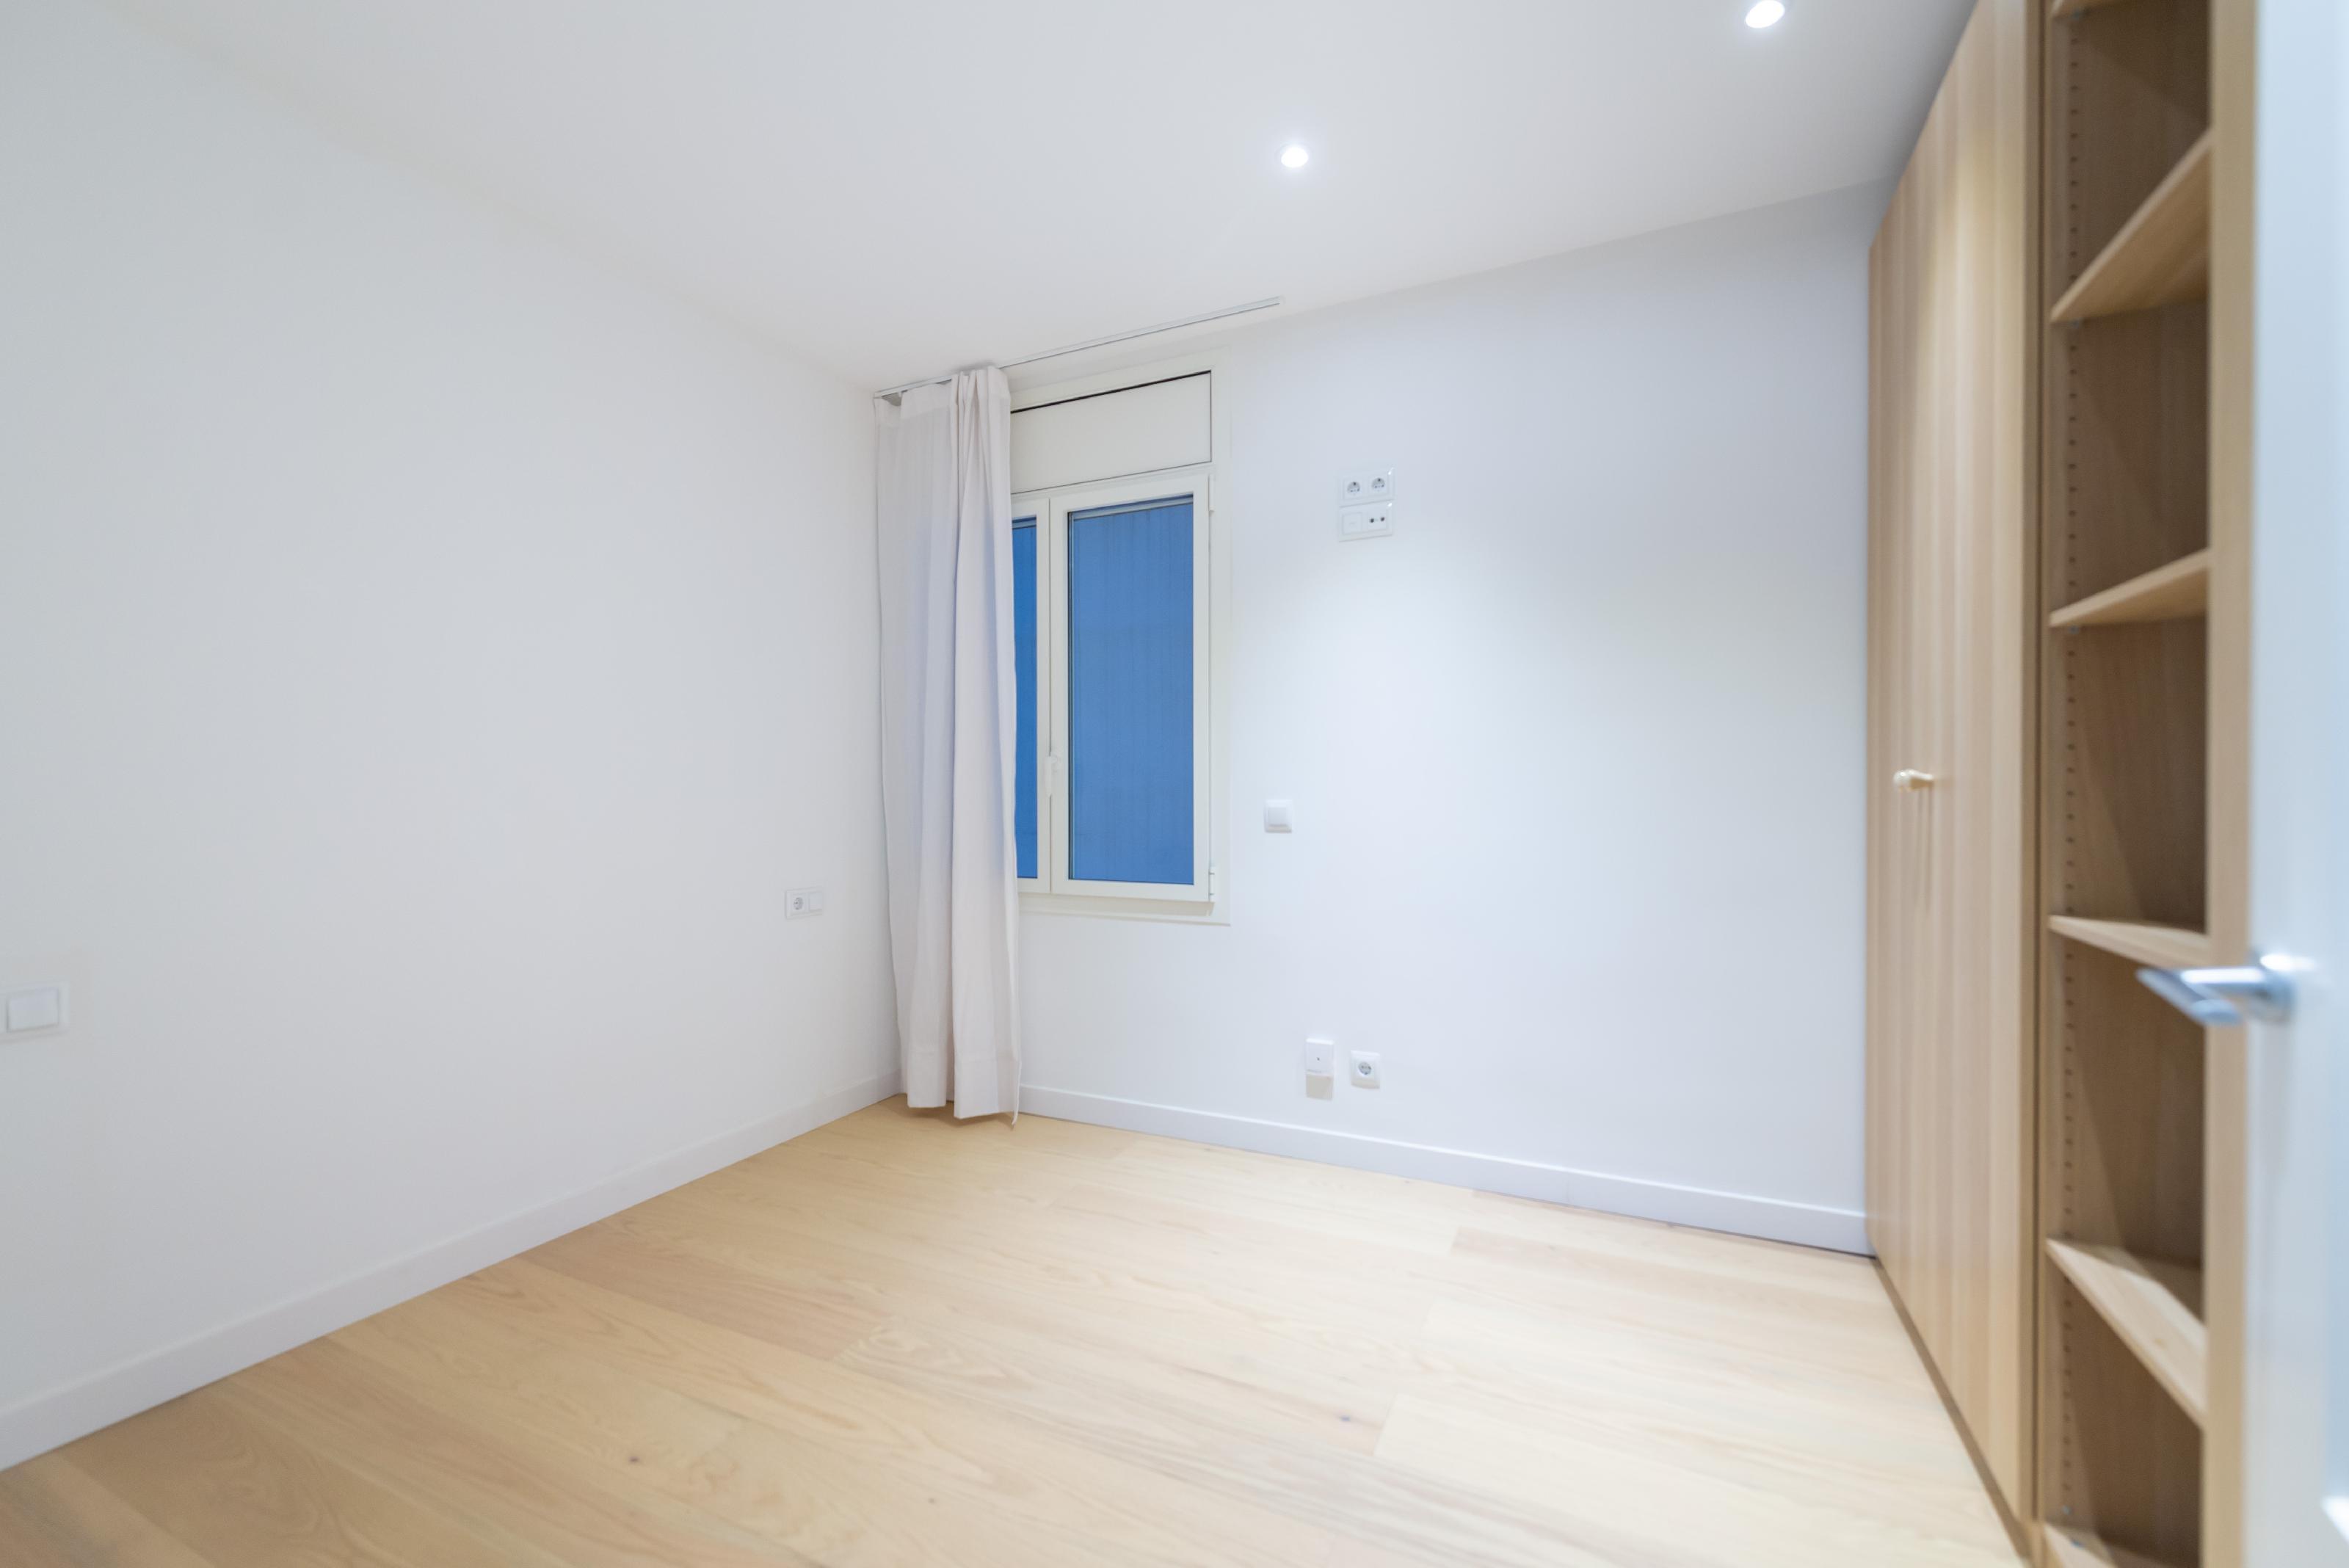 245231 Flat for sale in Sarrià-Sant Gervasi, Sant Gervasi-Galvany 14